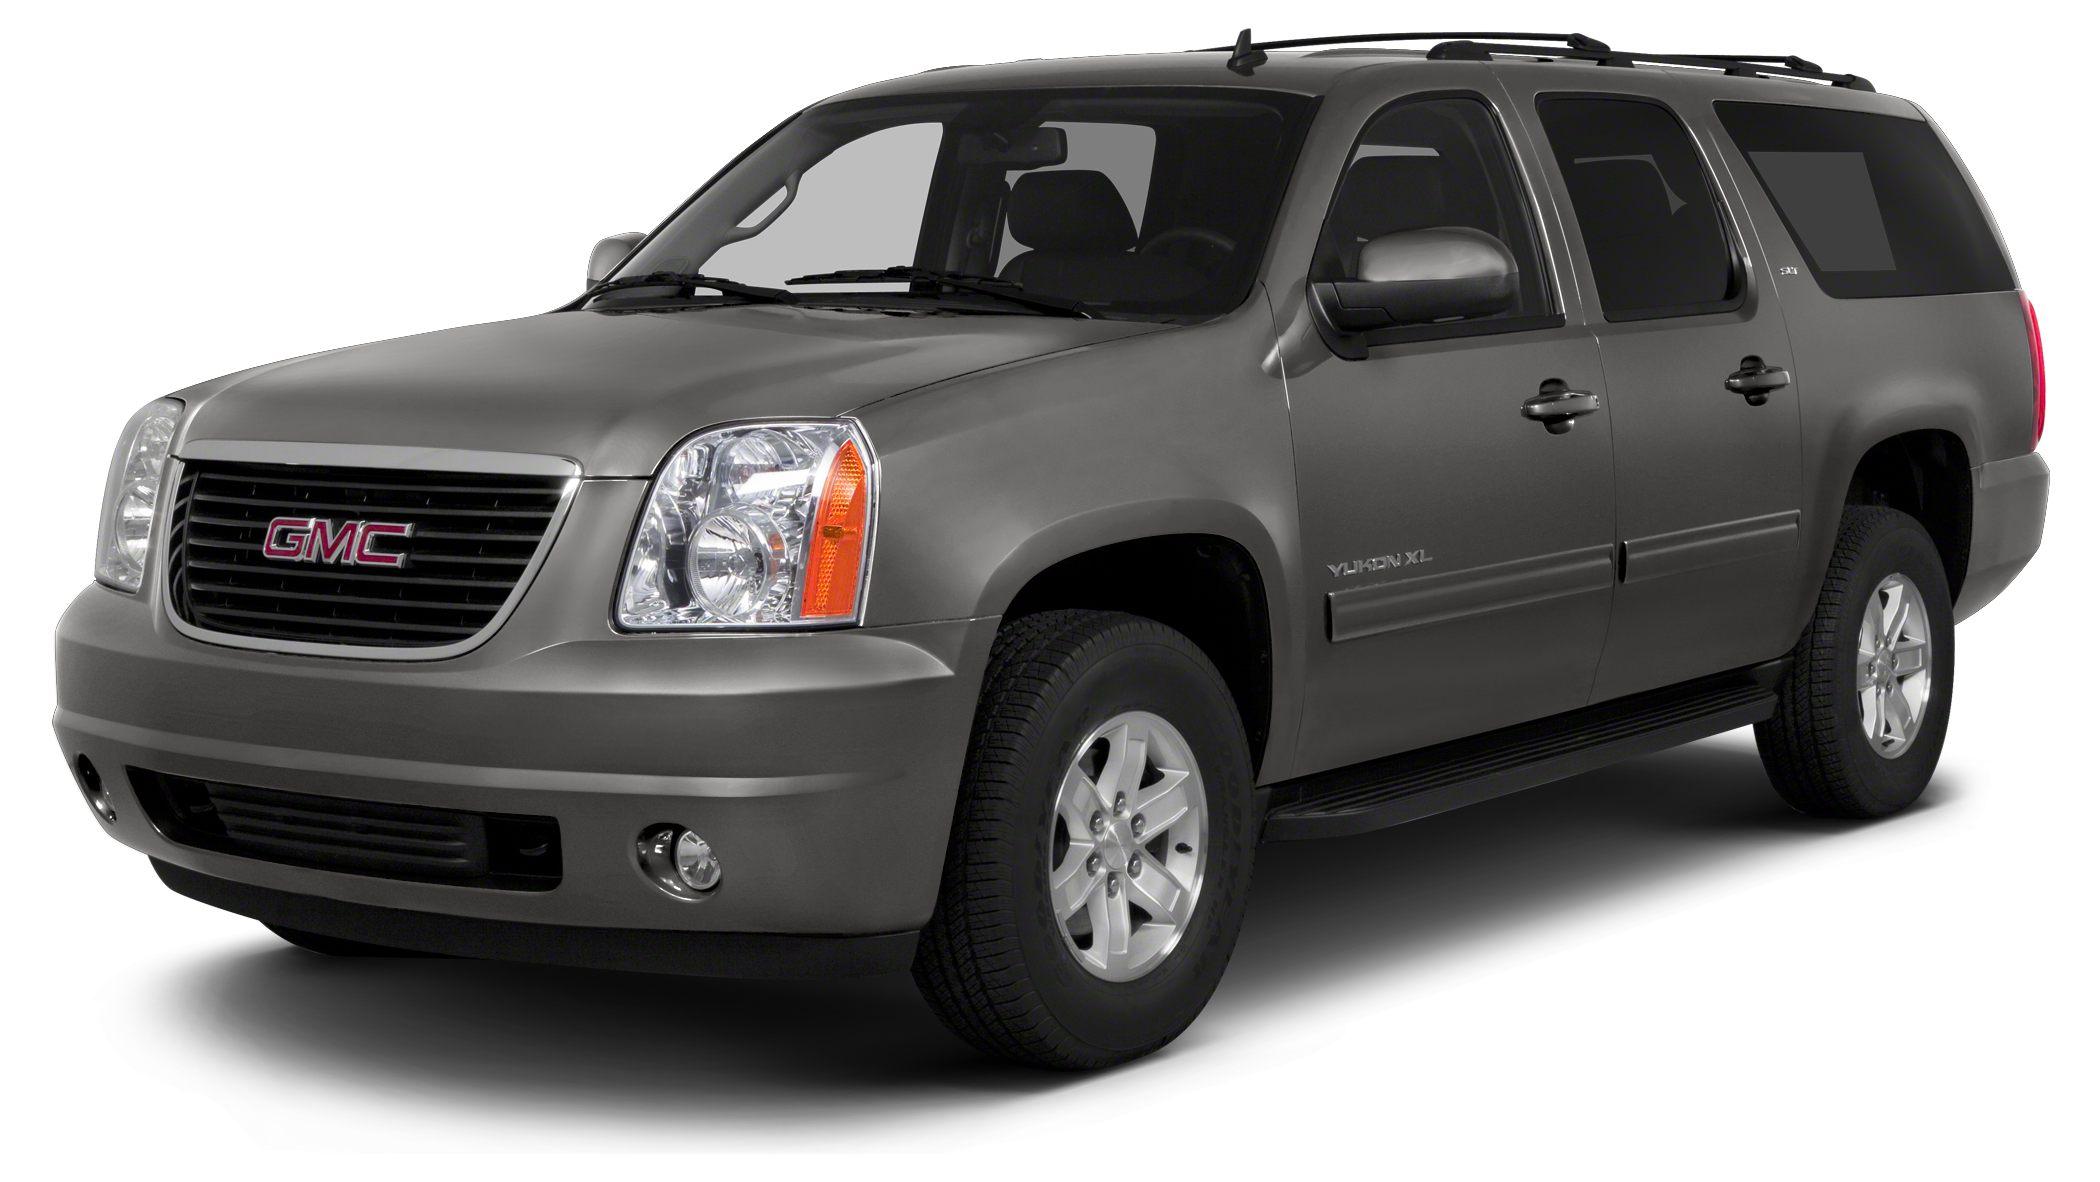 2012 GMC Yukon XL 1500 SLT Miles 68273Color Gray Stock C950 VIN 1GKS1KE09CR254787